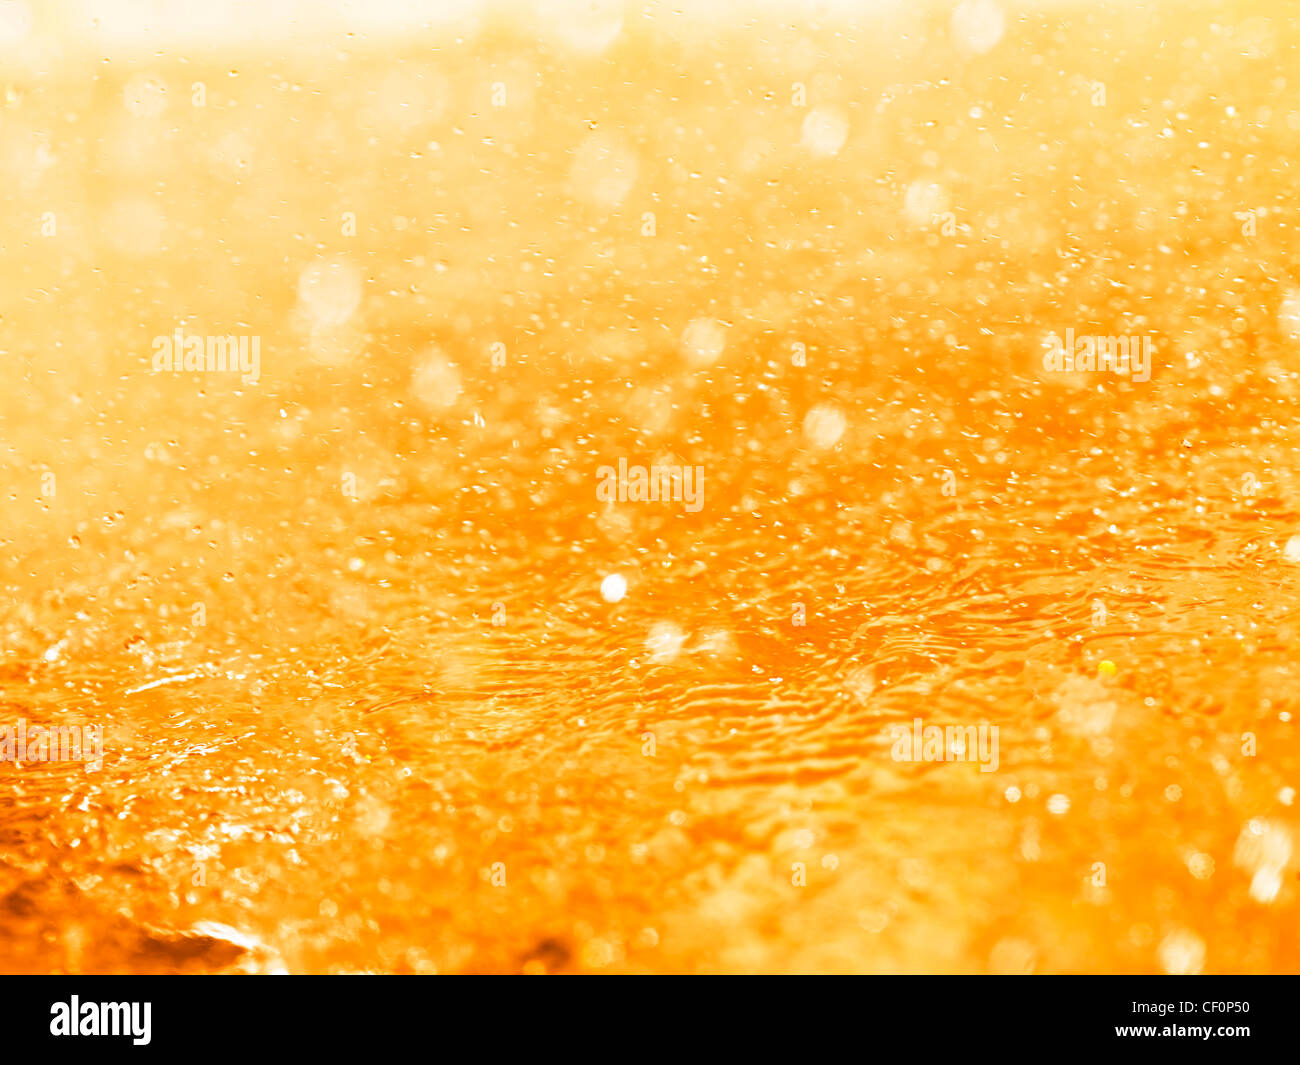 Orange splashing liquid closeup abstract background texture - Stock Image